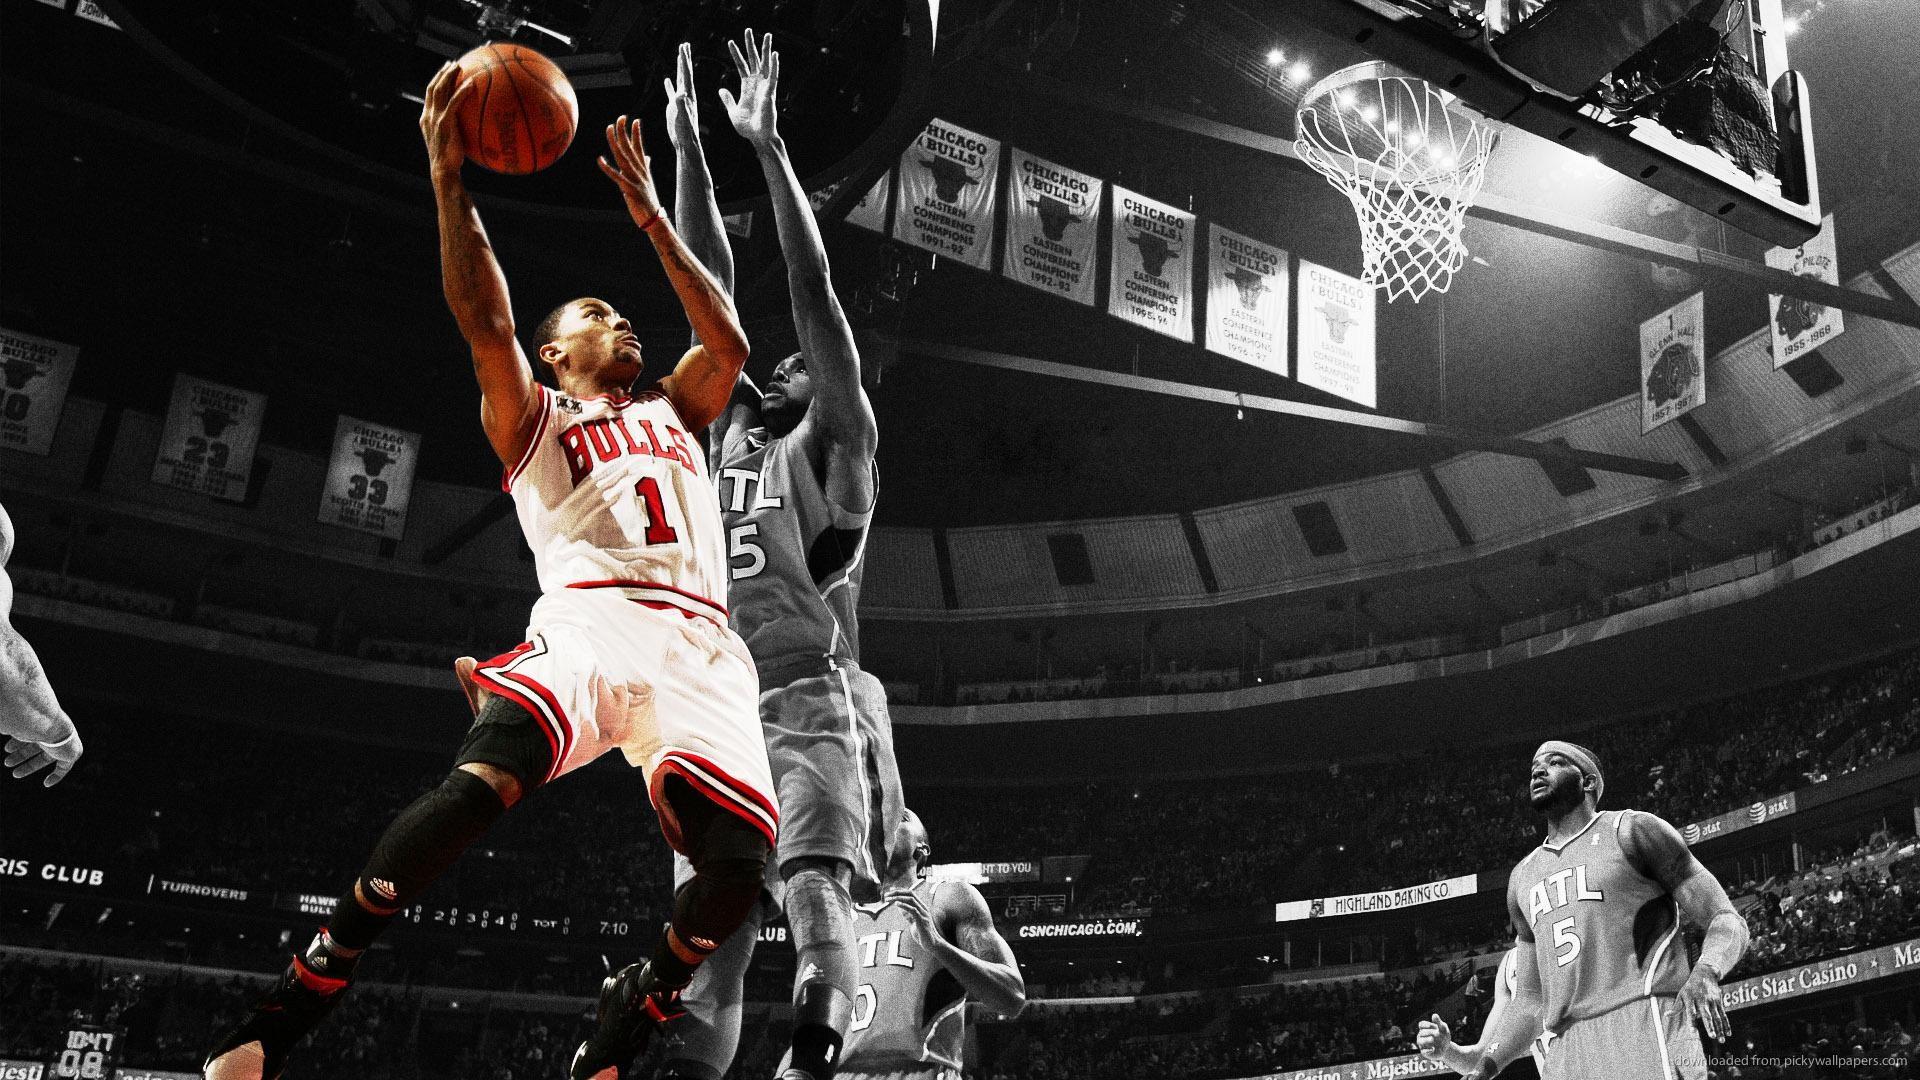 Derrick rose dunk on lebron james wallpaper